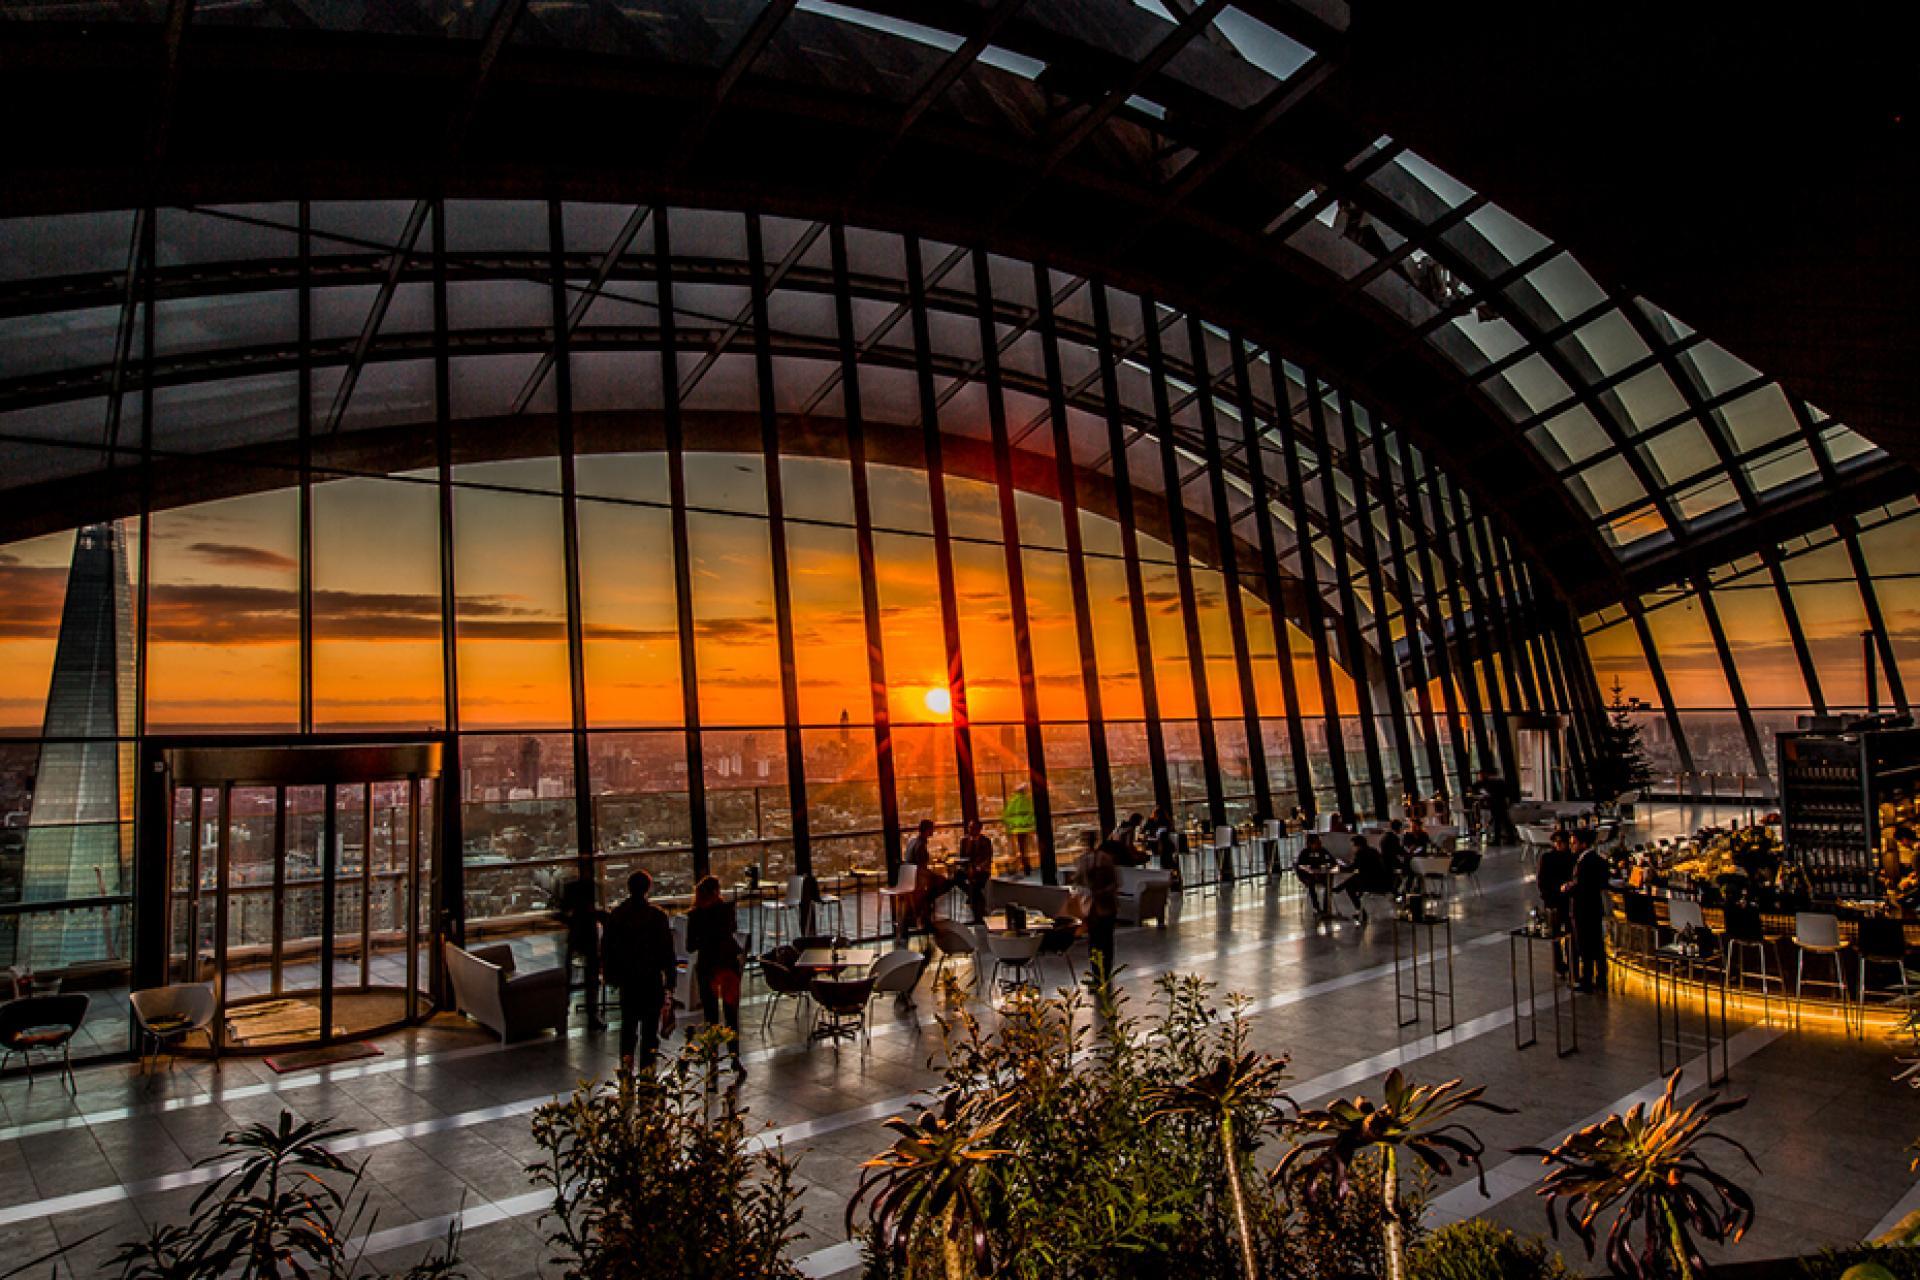 Sky Garden Rooftop Bar